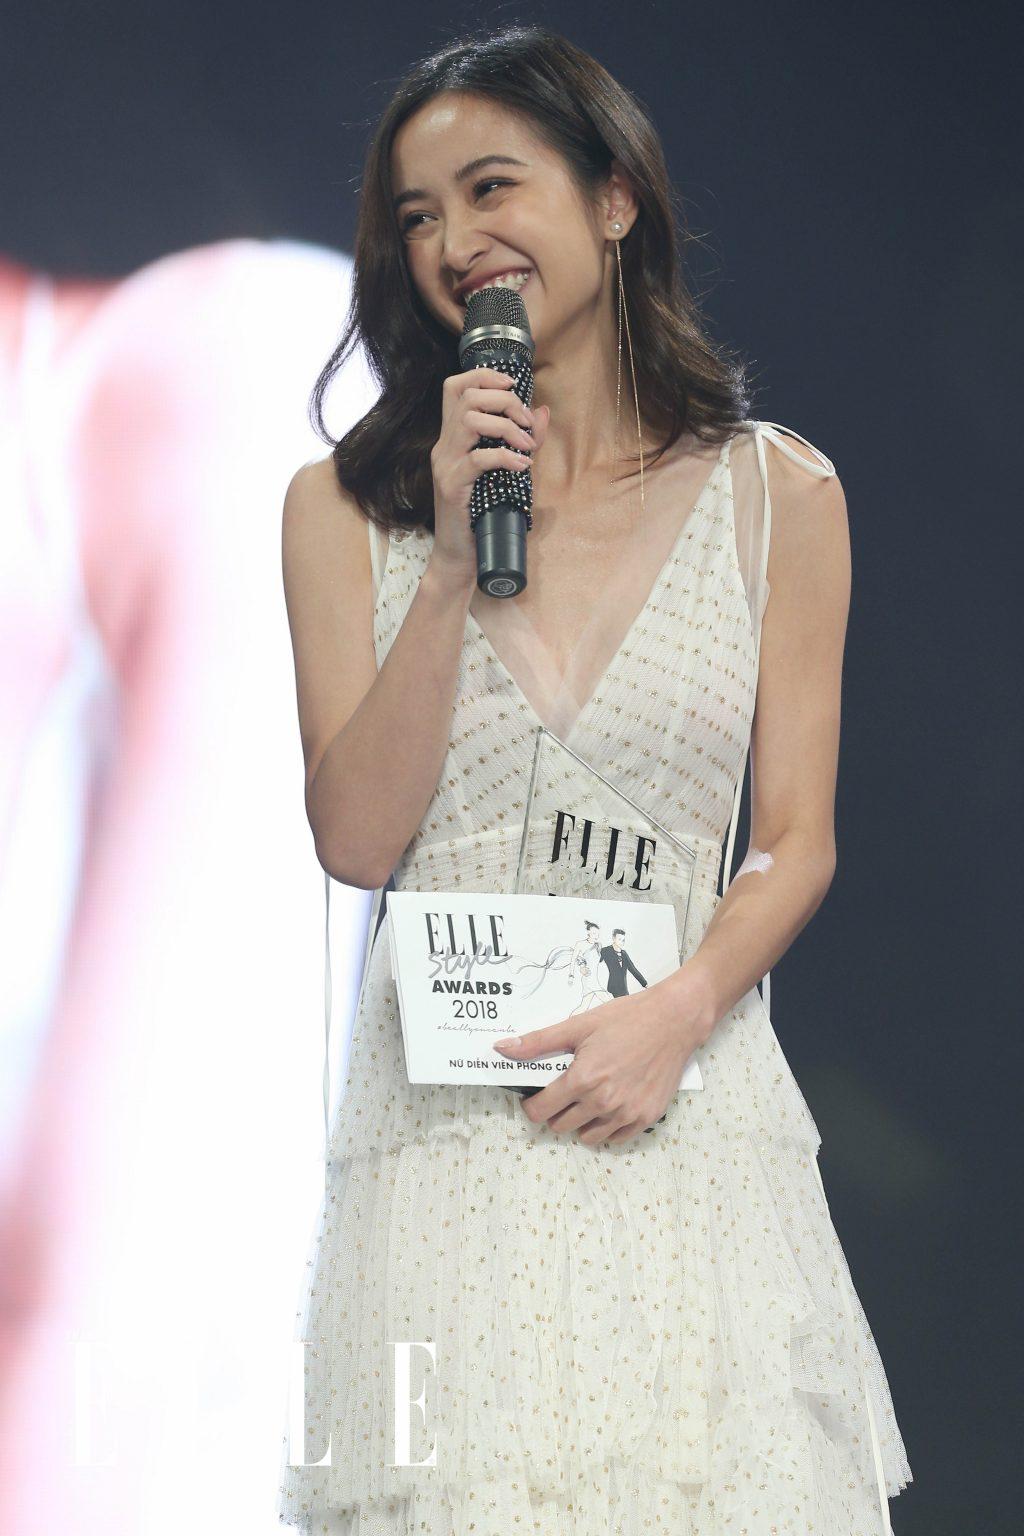 elle style awards 2018 jun vu nhan giai (2)